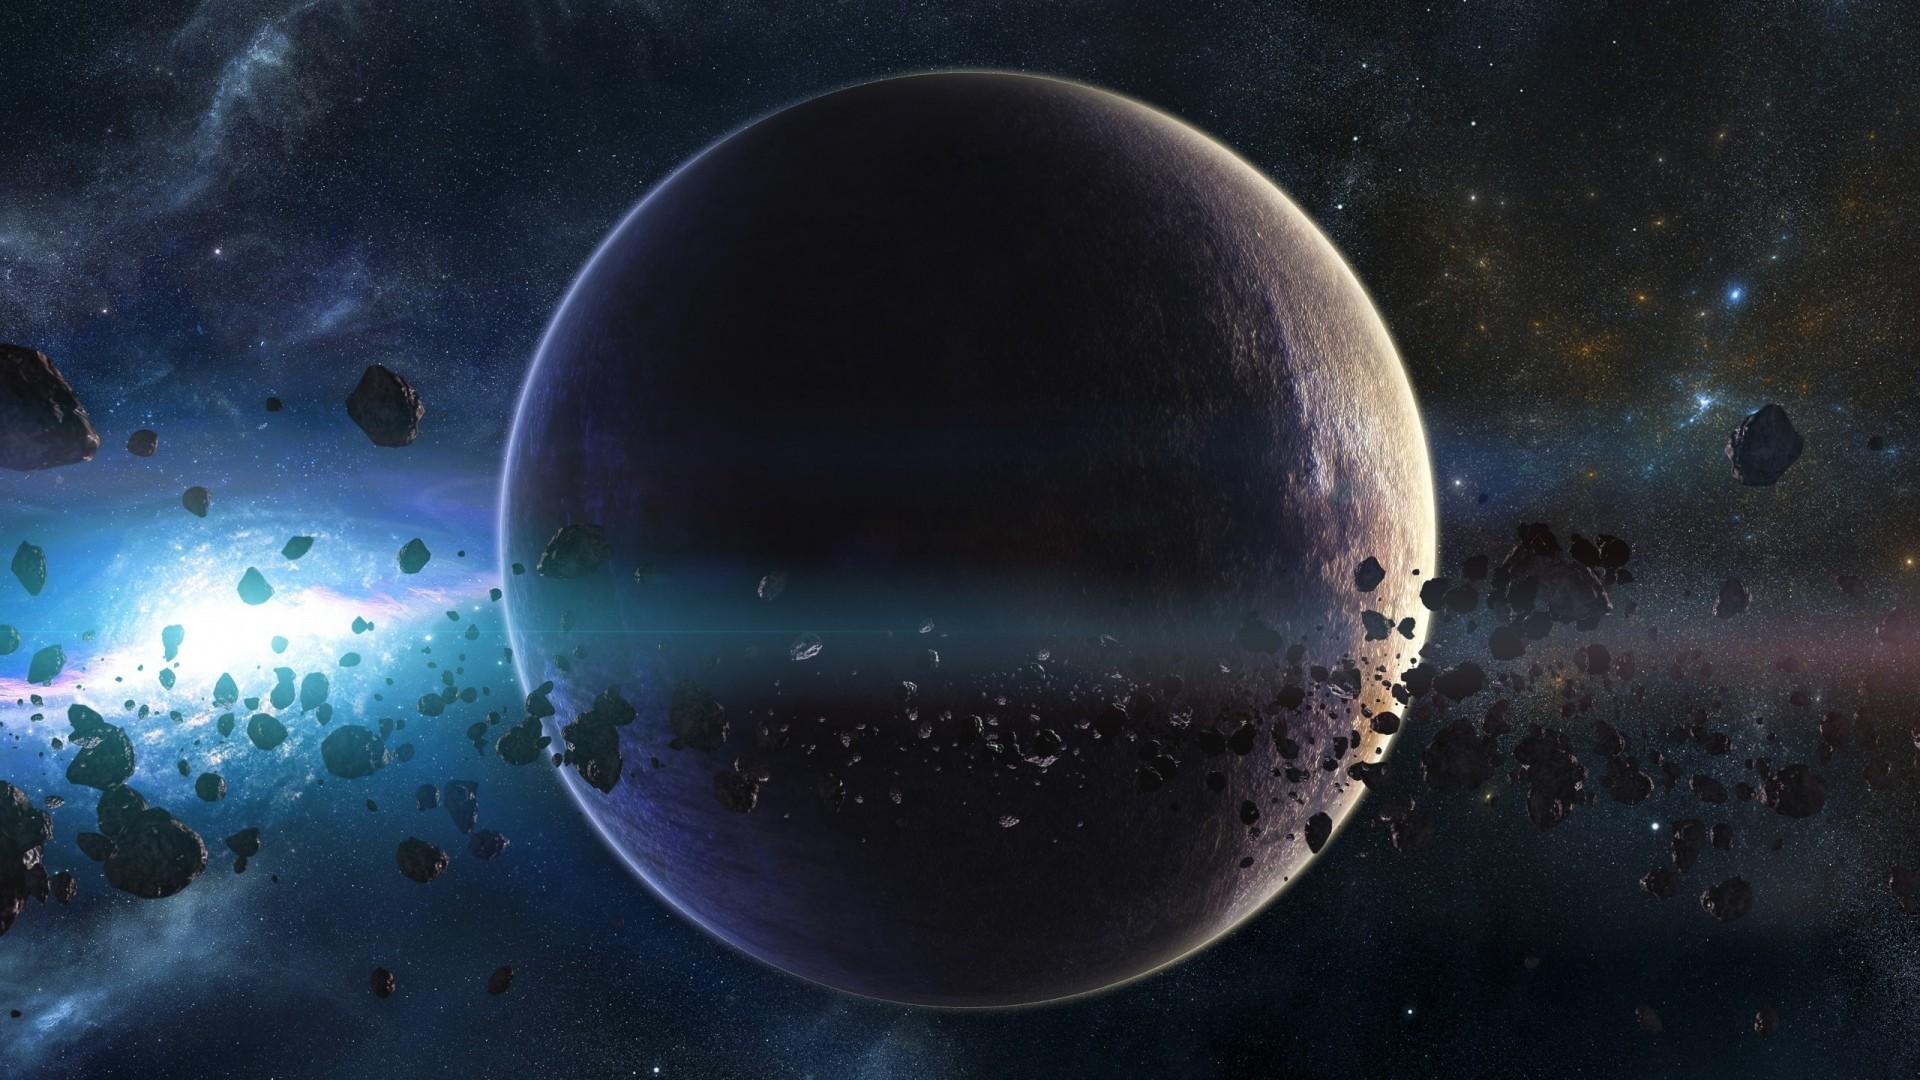 Wallpaper space, planets, asteroids, stars, belt, galaxy